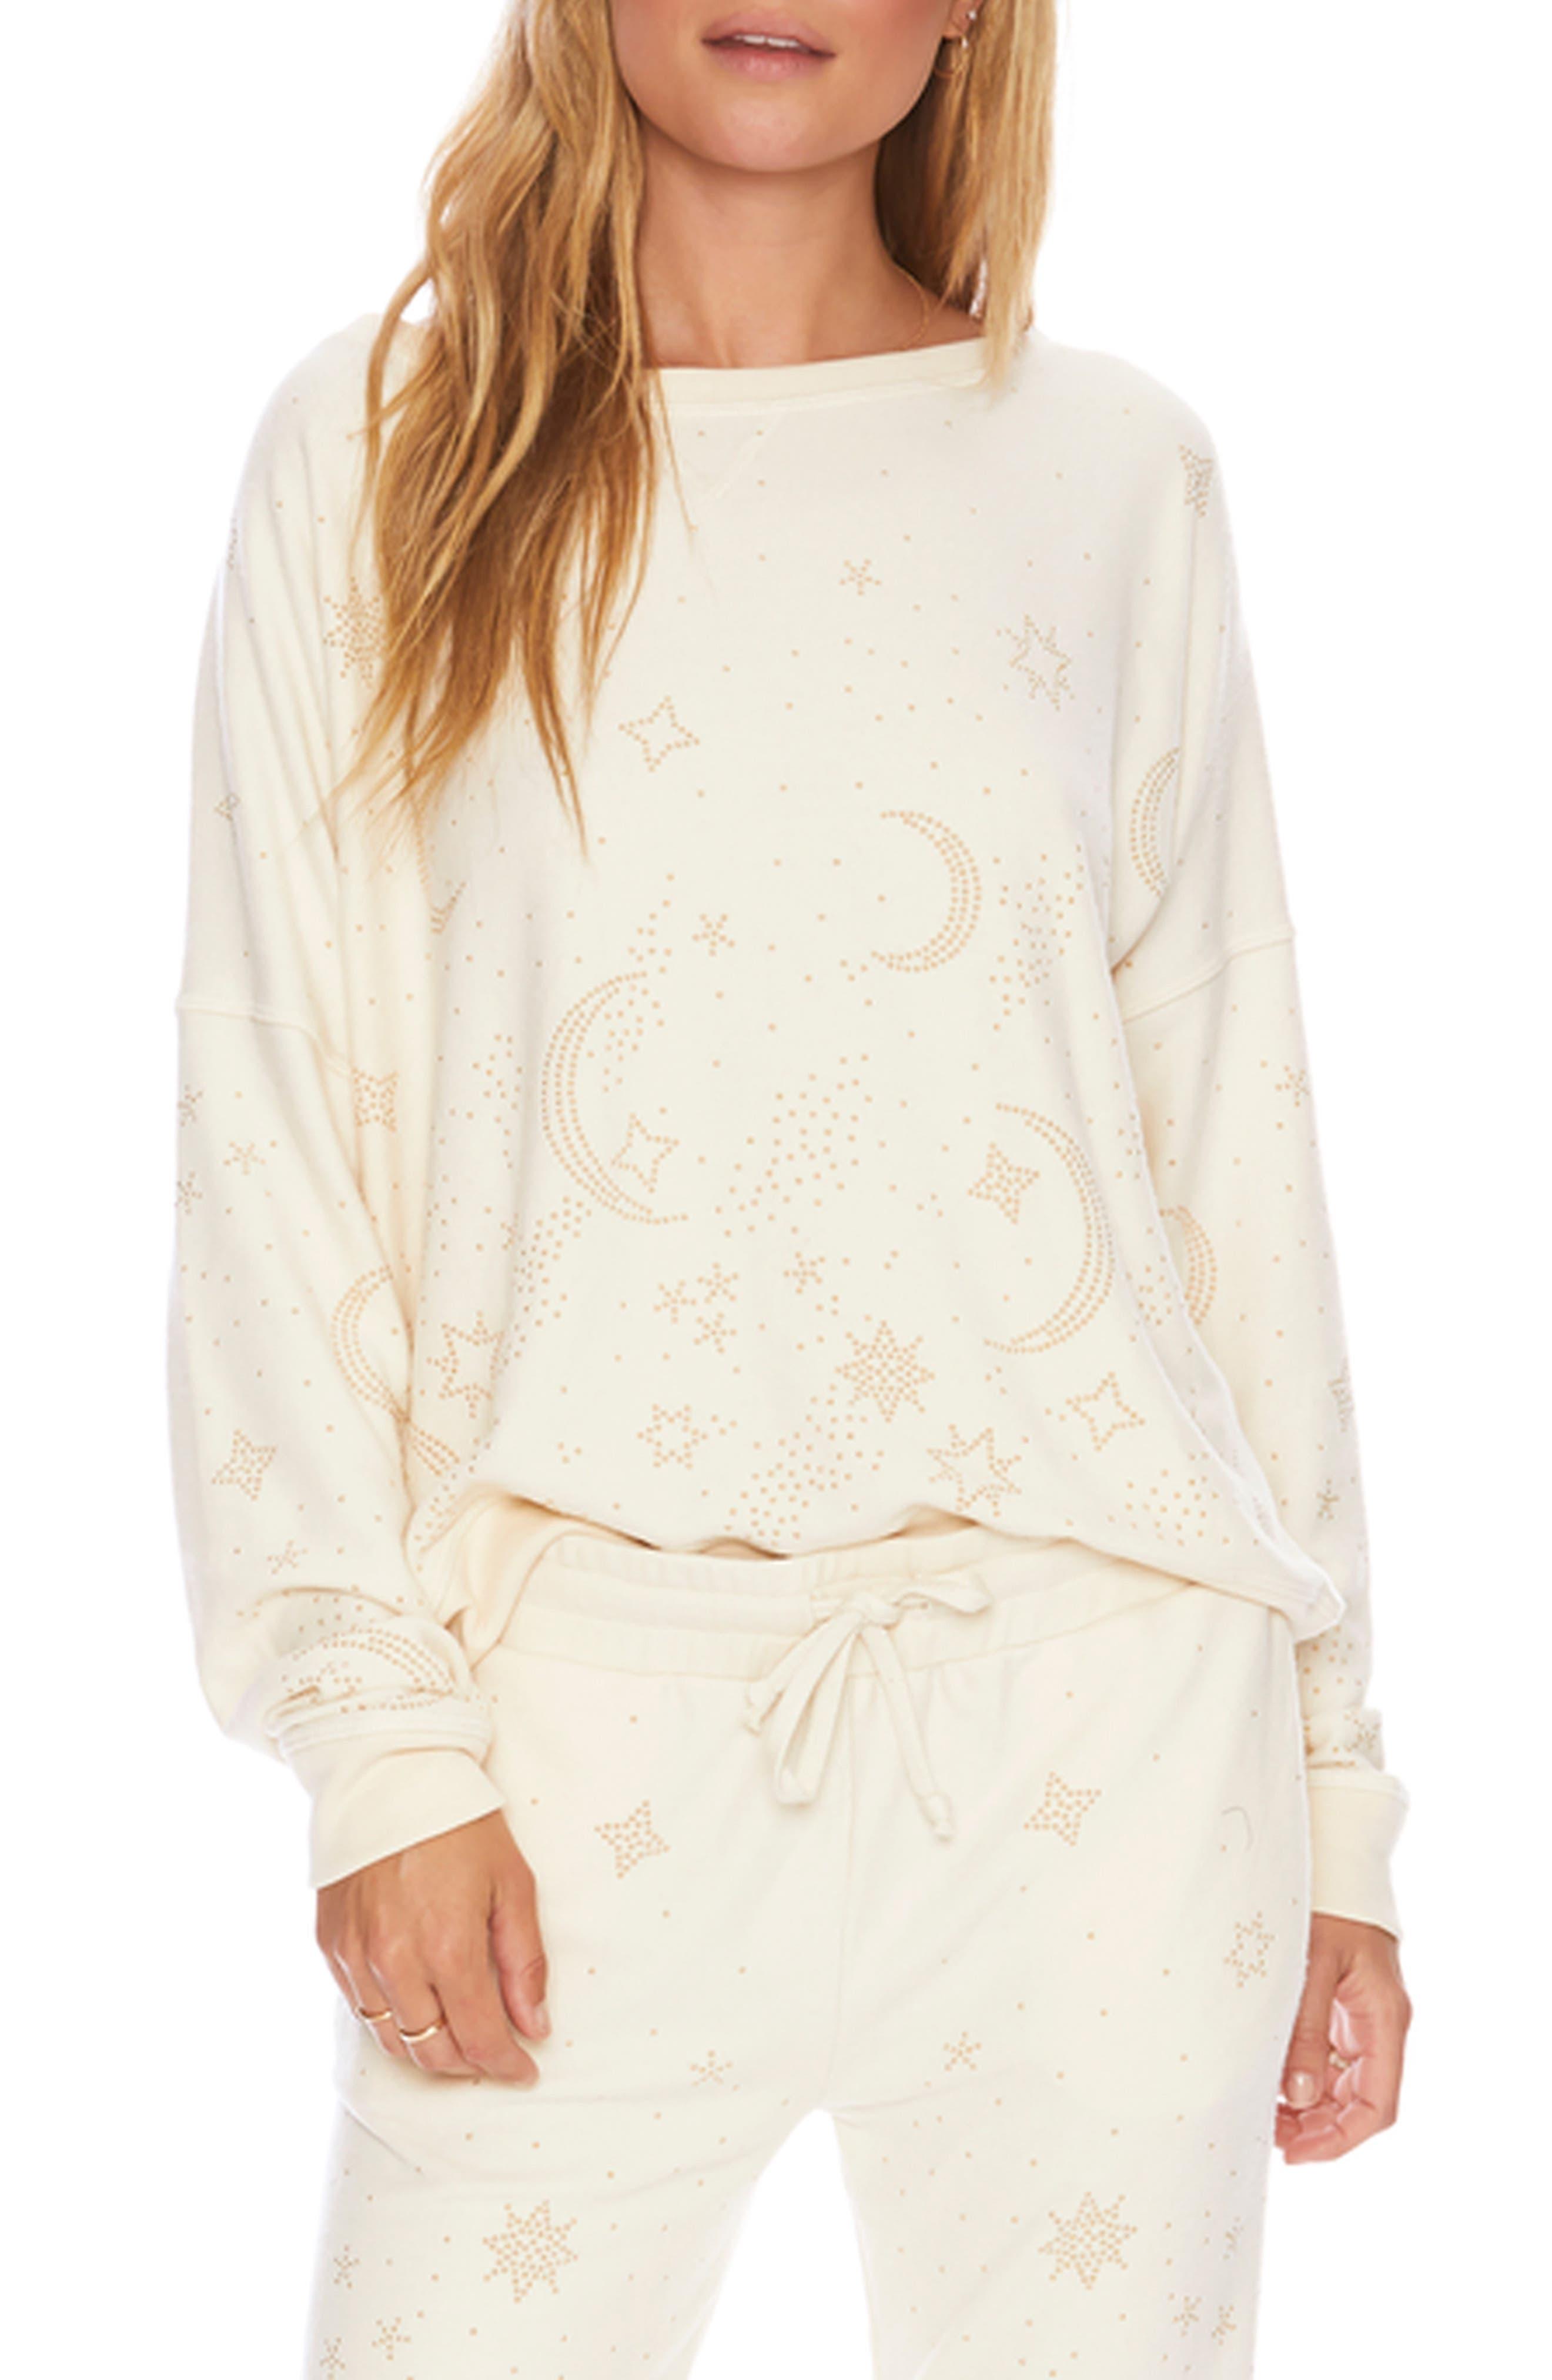 BEACH RIOT Moon Studded Sweatshirt in Ivory